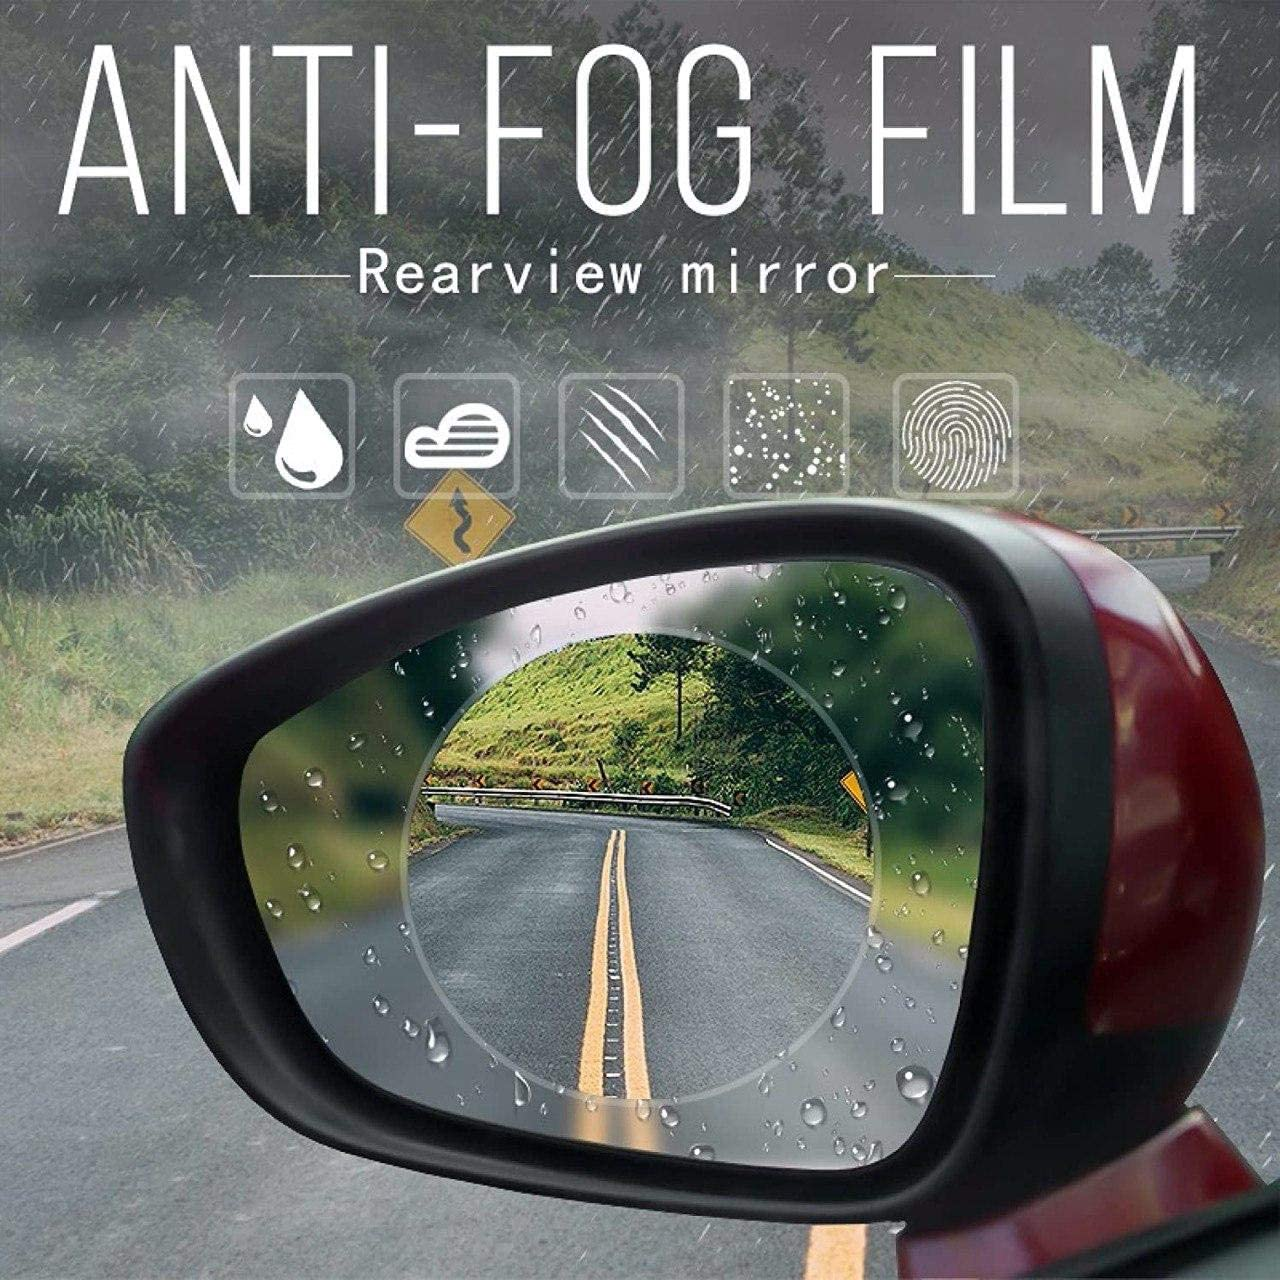 010-12653-0F Garmin Pilot A2189068303 2019//2020 GPS Mercedes Benz Navigation SD Card Anti Fog Rearview Mirror Sticker Included Version 13.0